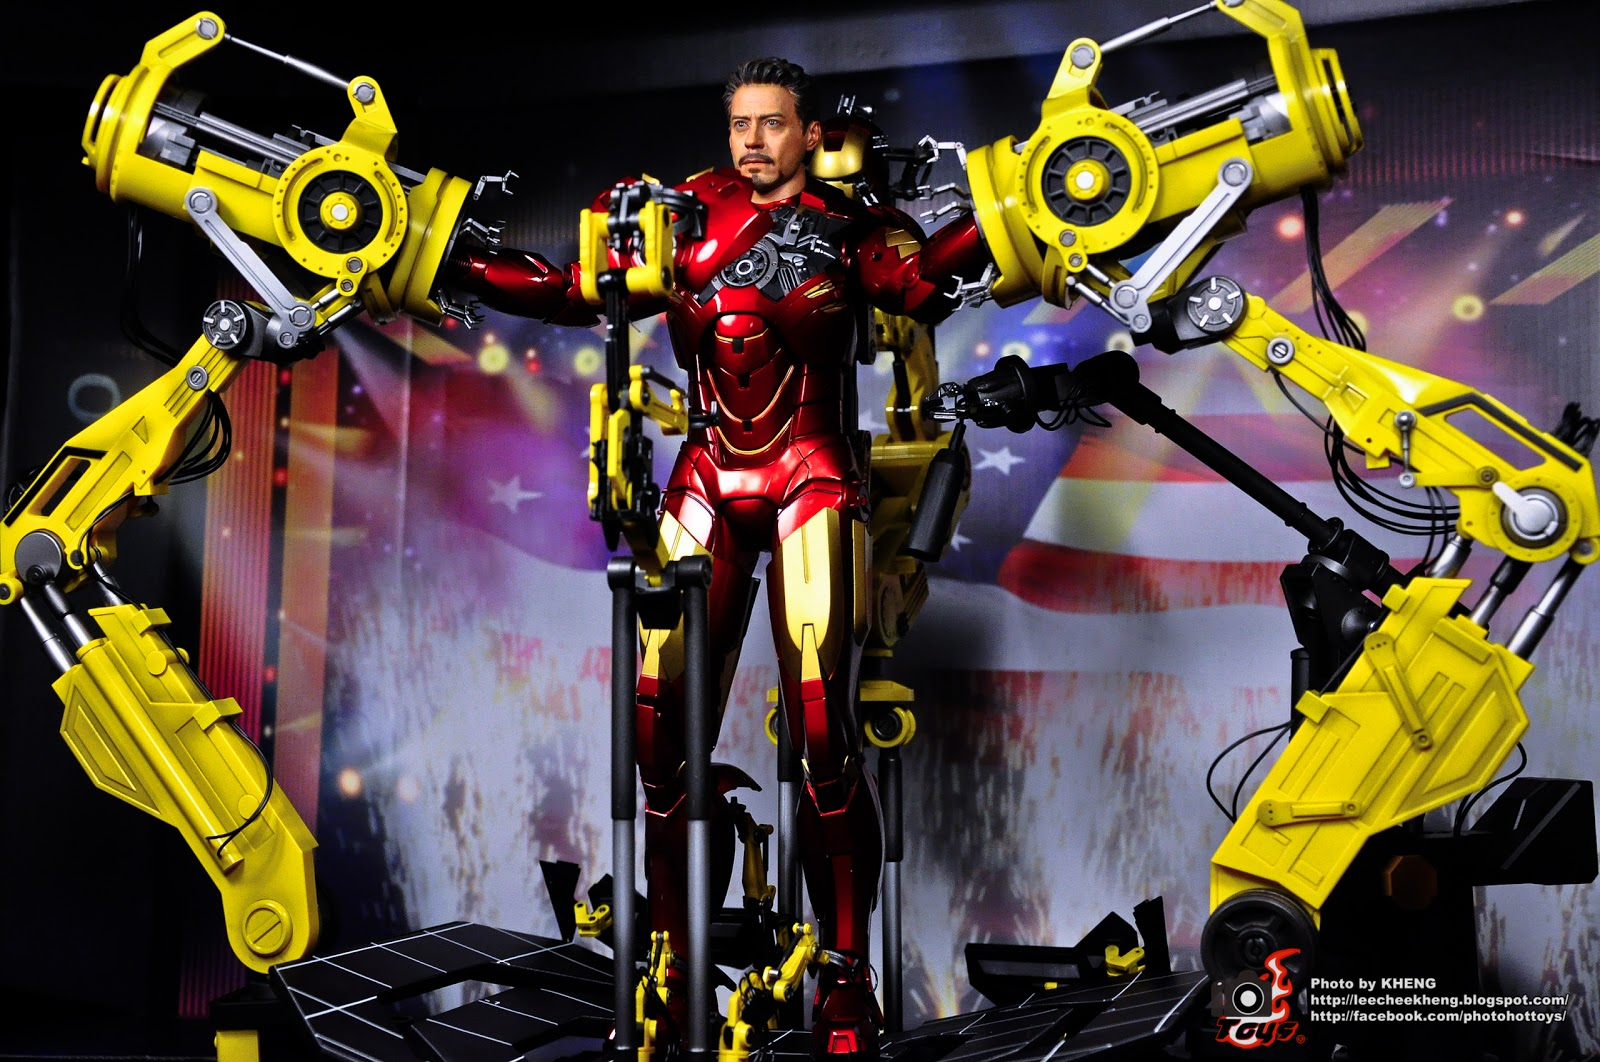 Iron Man 2 Hot Toys Suit Up Gantry With Mark Iv Iron Man 1 | Auto ...